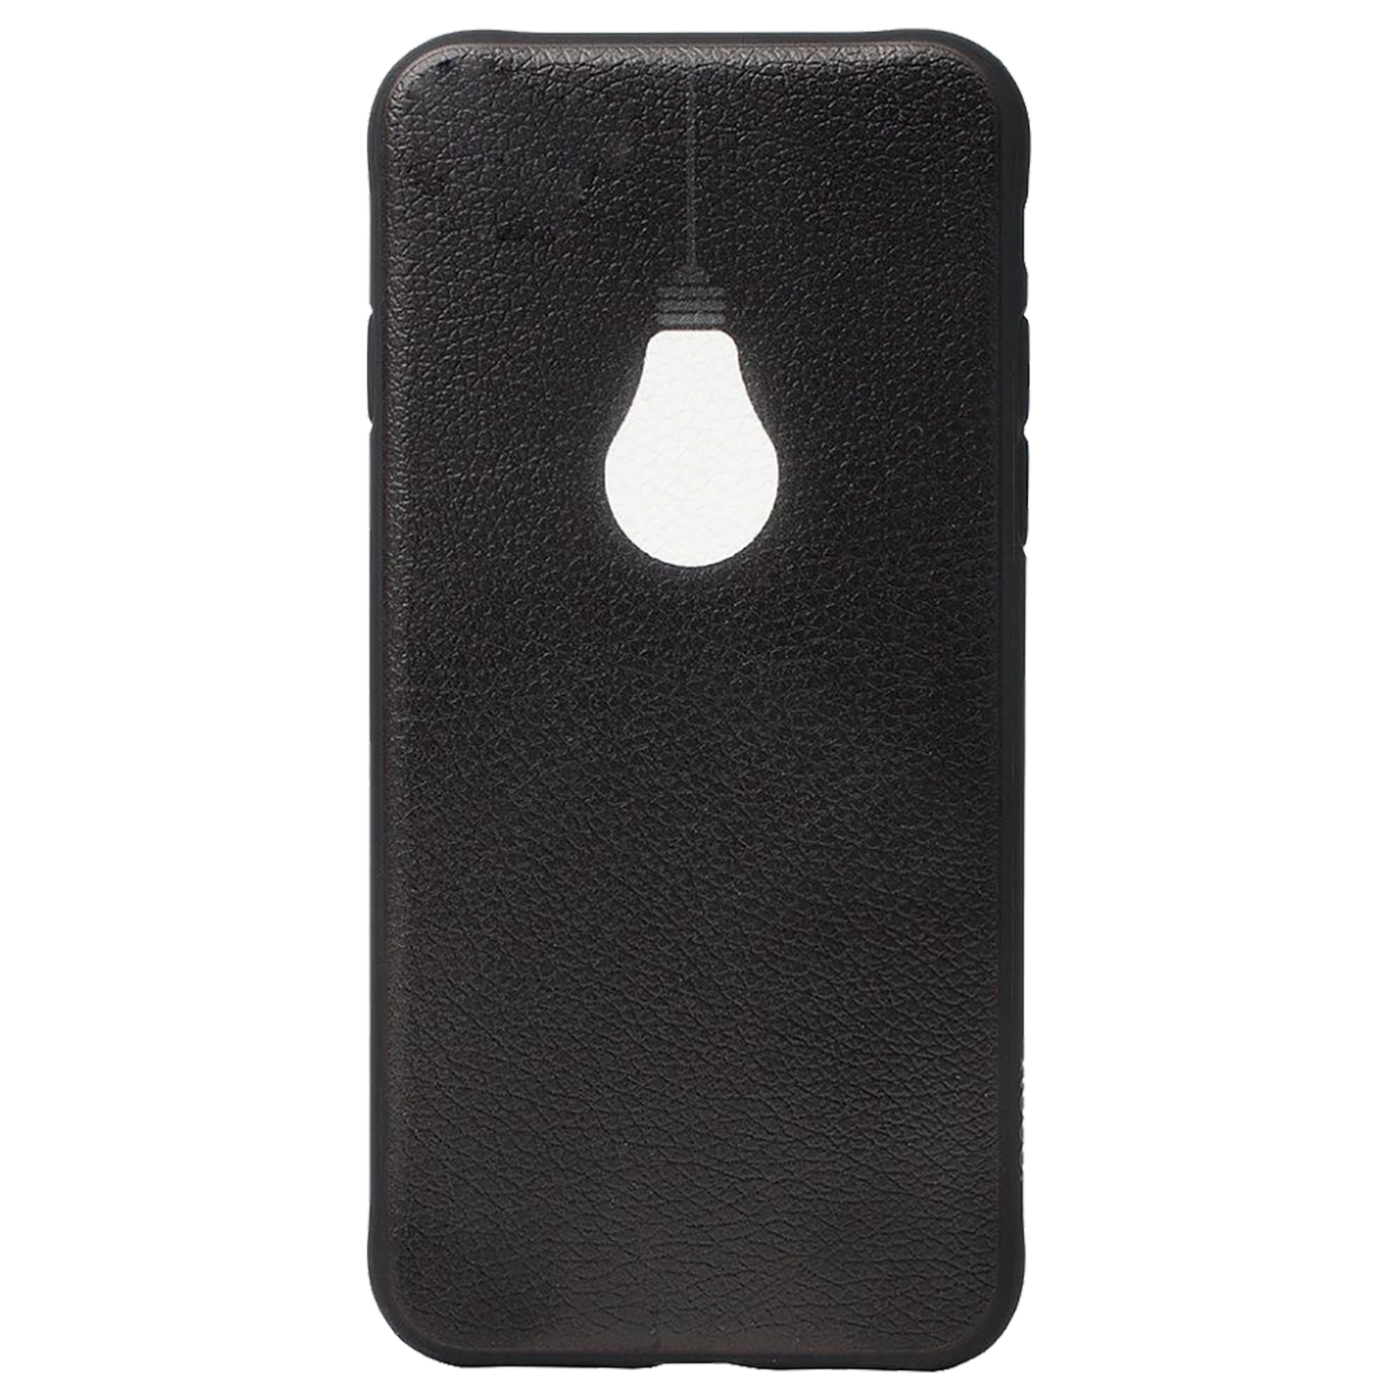 hoco. - Colored Series Case, Galaxy A3 bulb